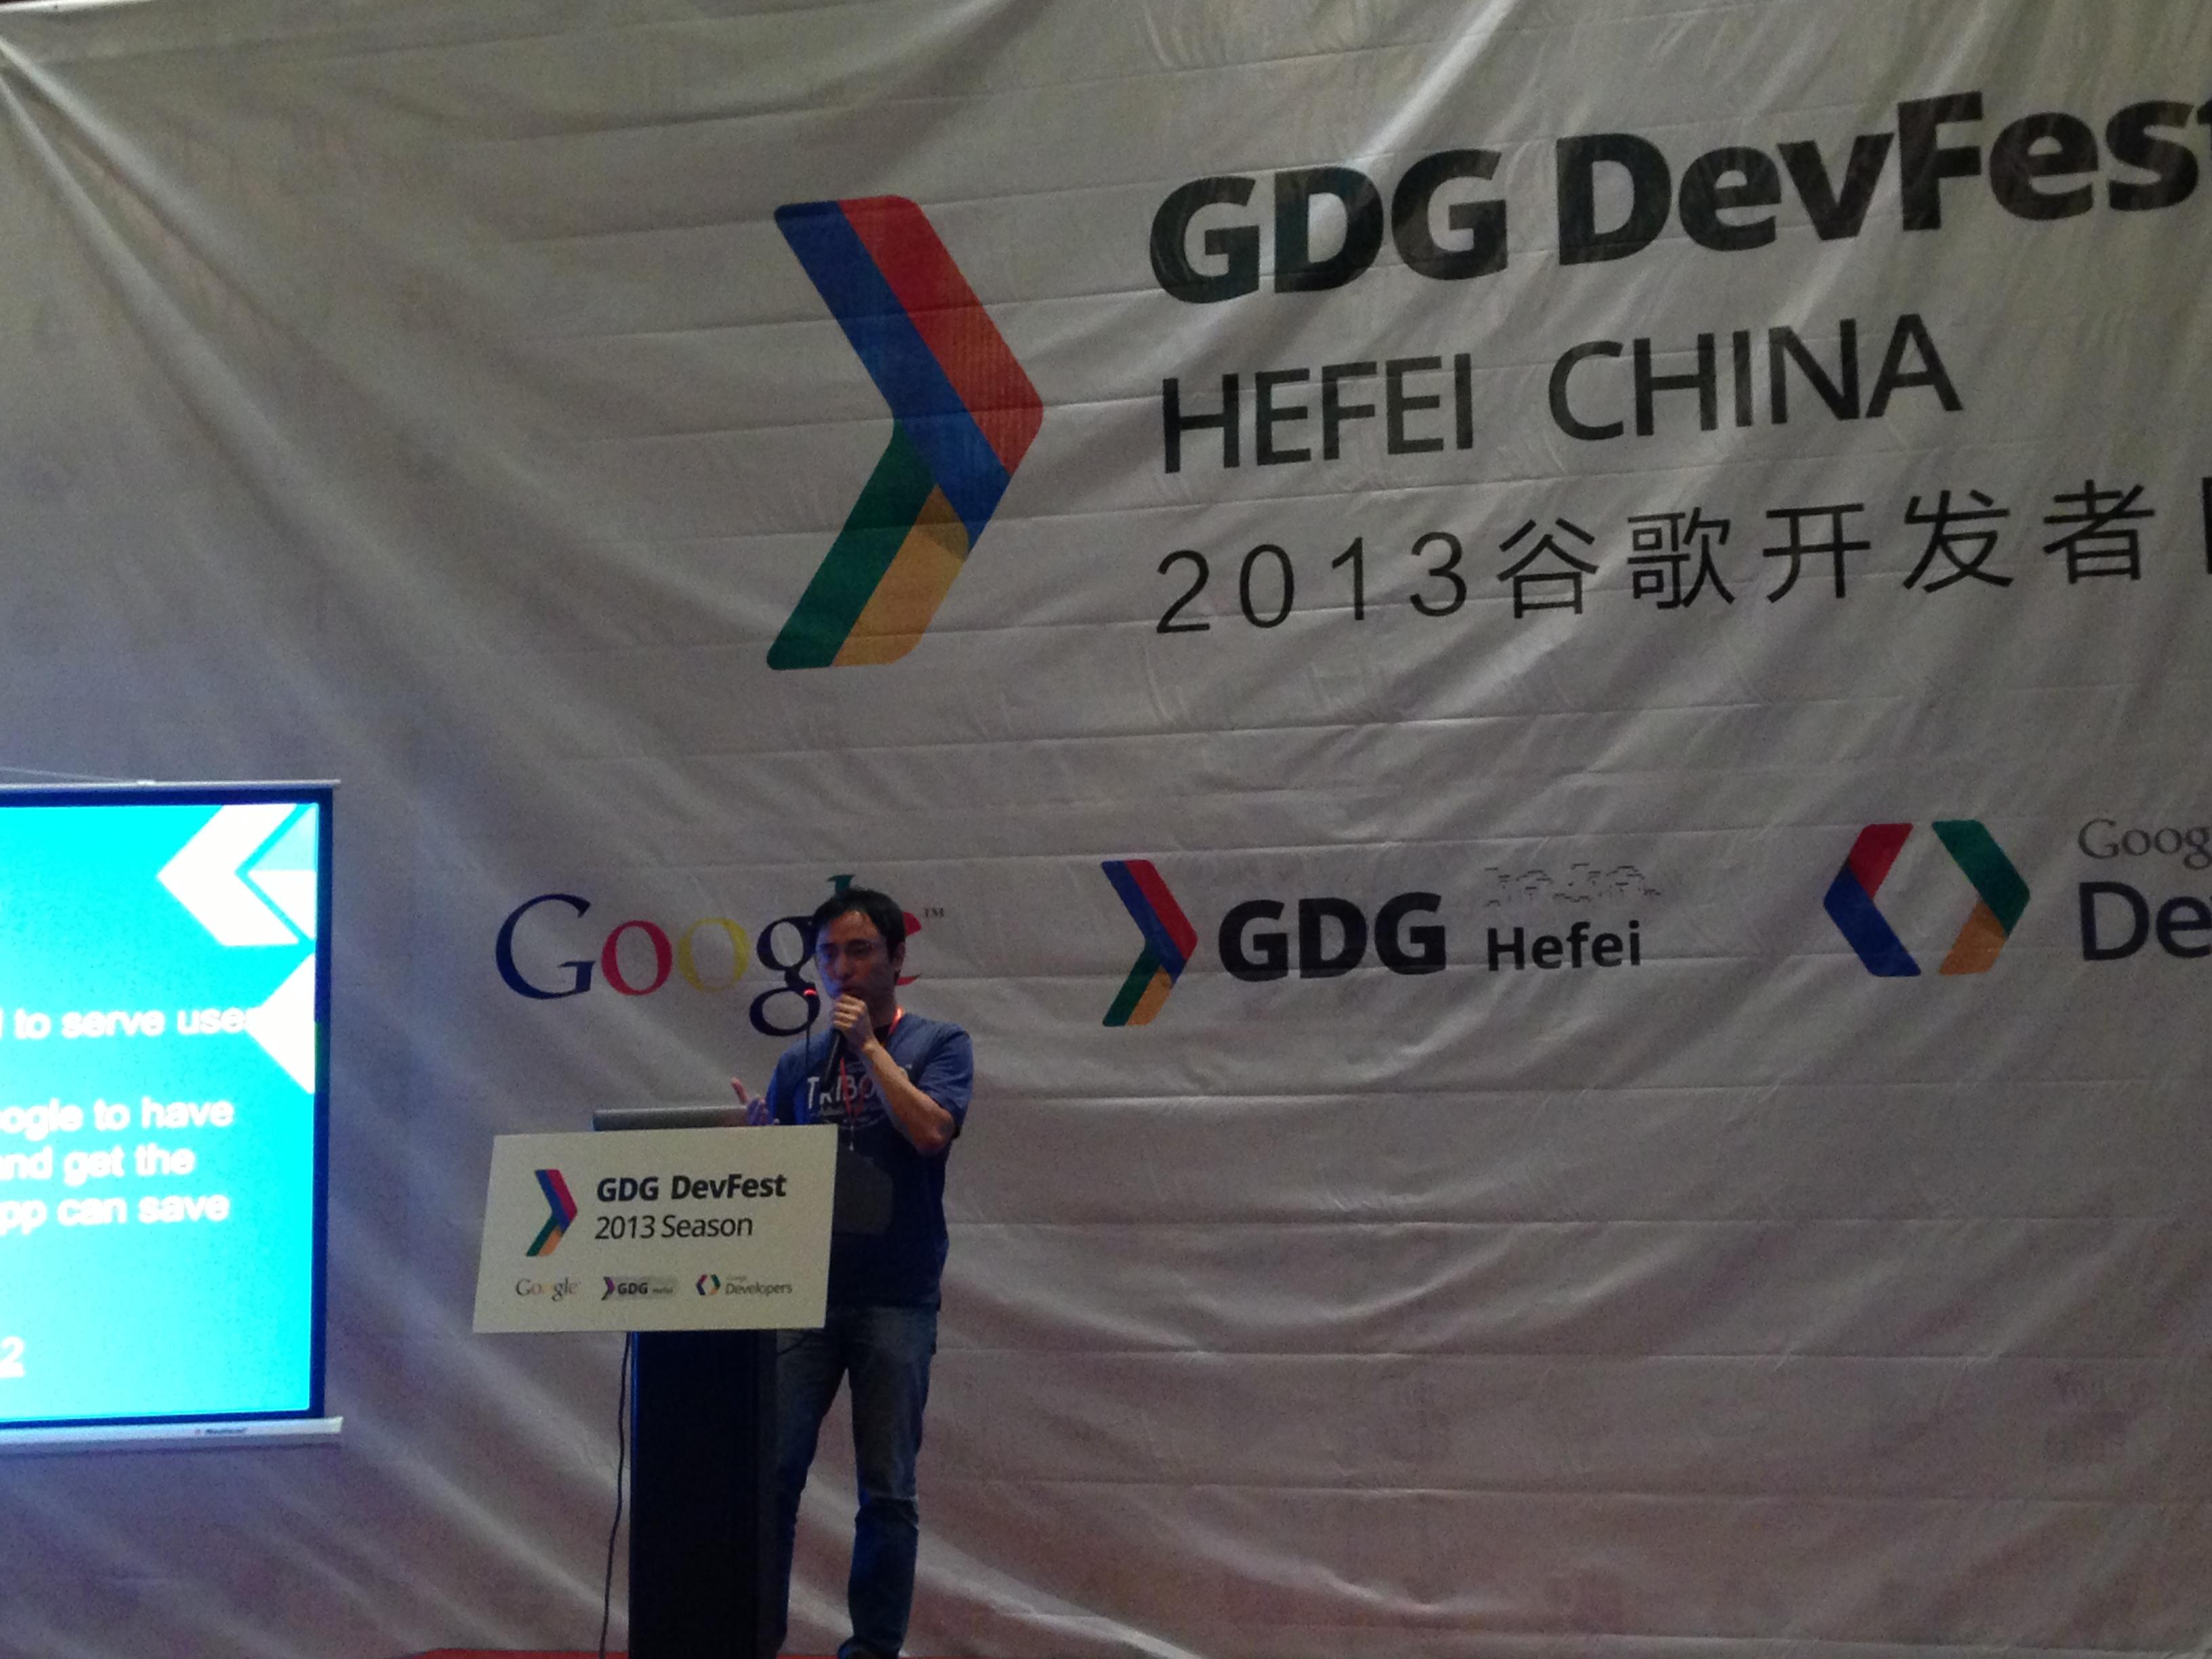 Google DevFest 2013 Hefei